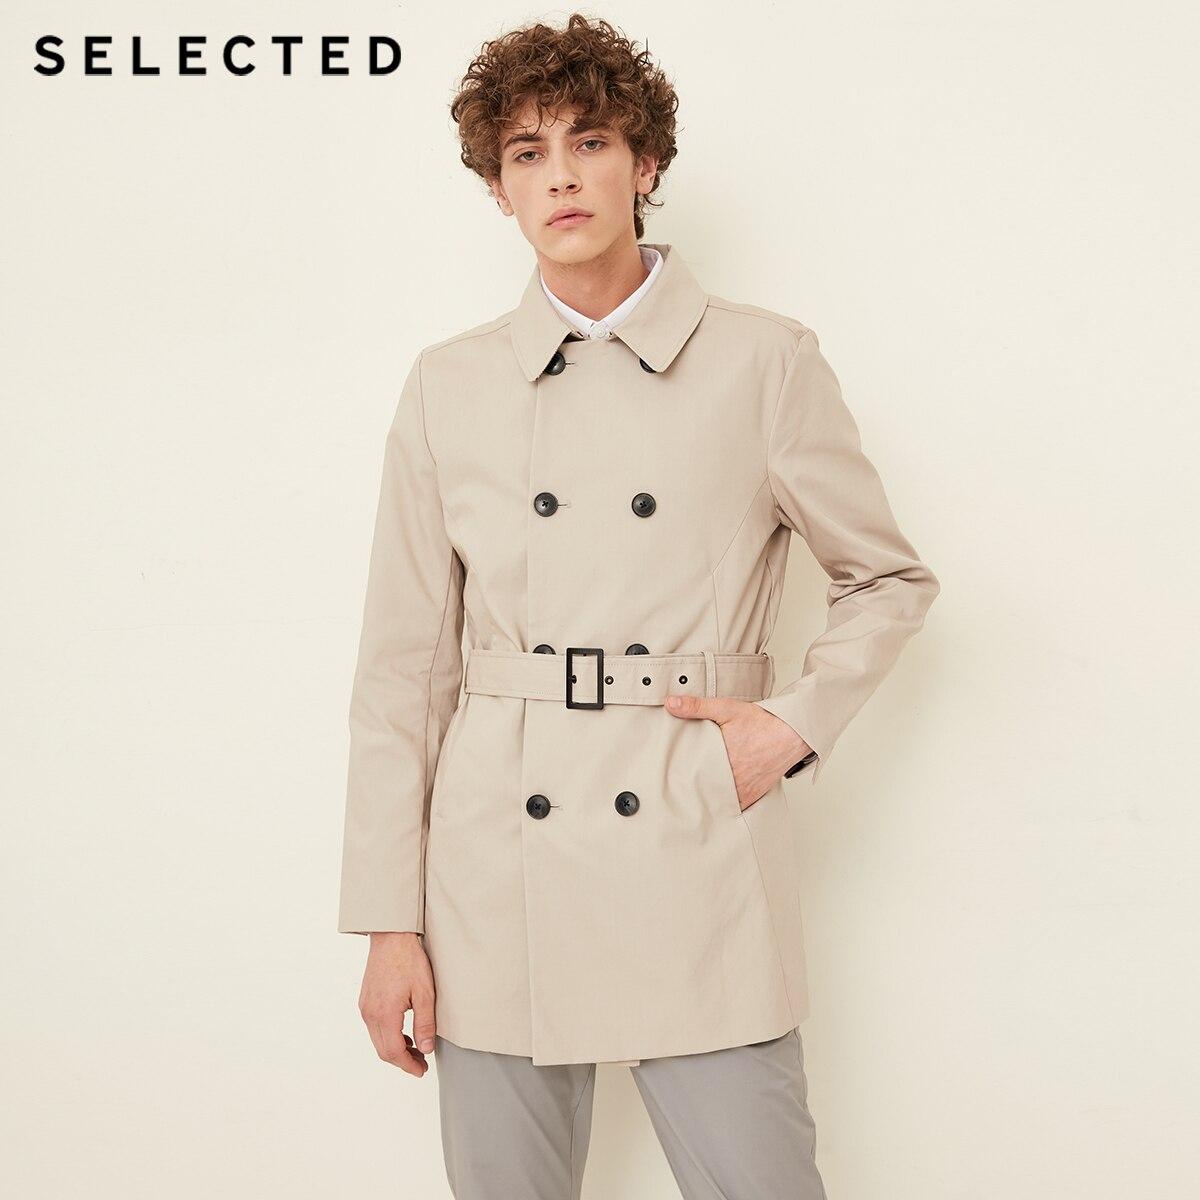 Winter Men s Plus Velvet Hooded Faux Fur Leather Jacket Male Business Gentleman Warm PU Leather